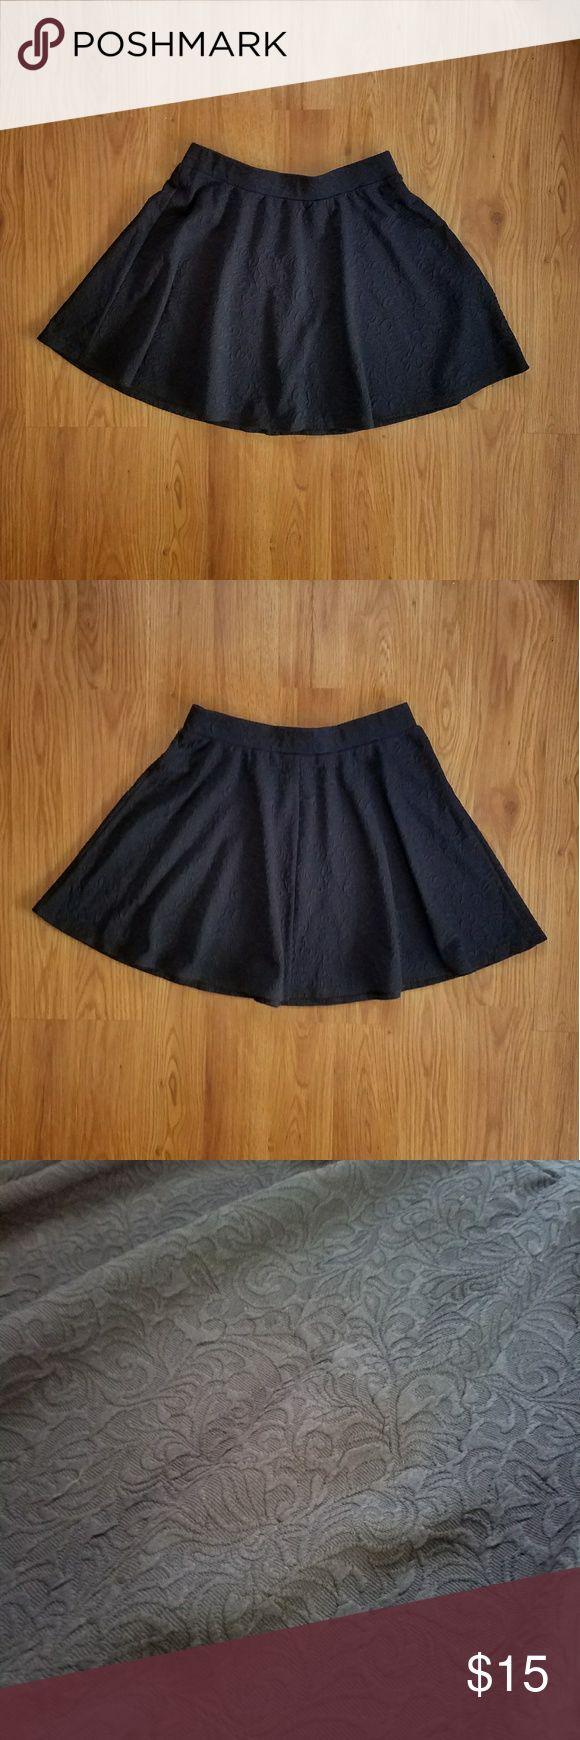 "NWOT Joe B floral textured black circle skirt Textured floral fabric design. Elastic waistband. Measurements are 26"" waist, 16"" length. Joe B Skirts"